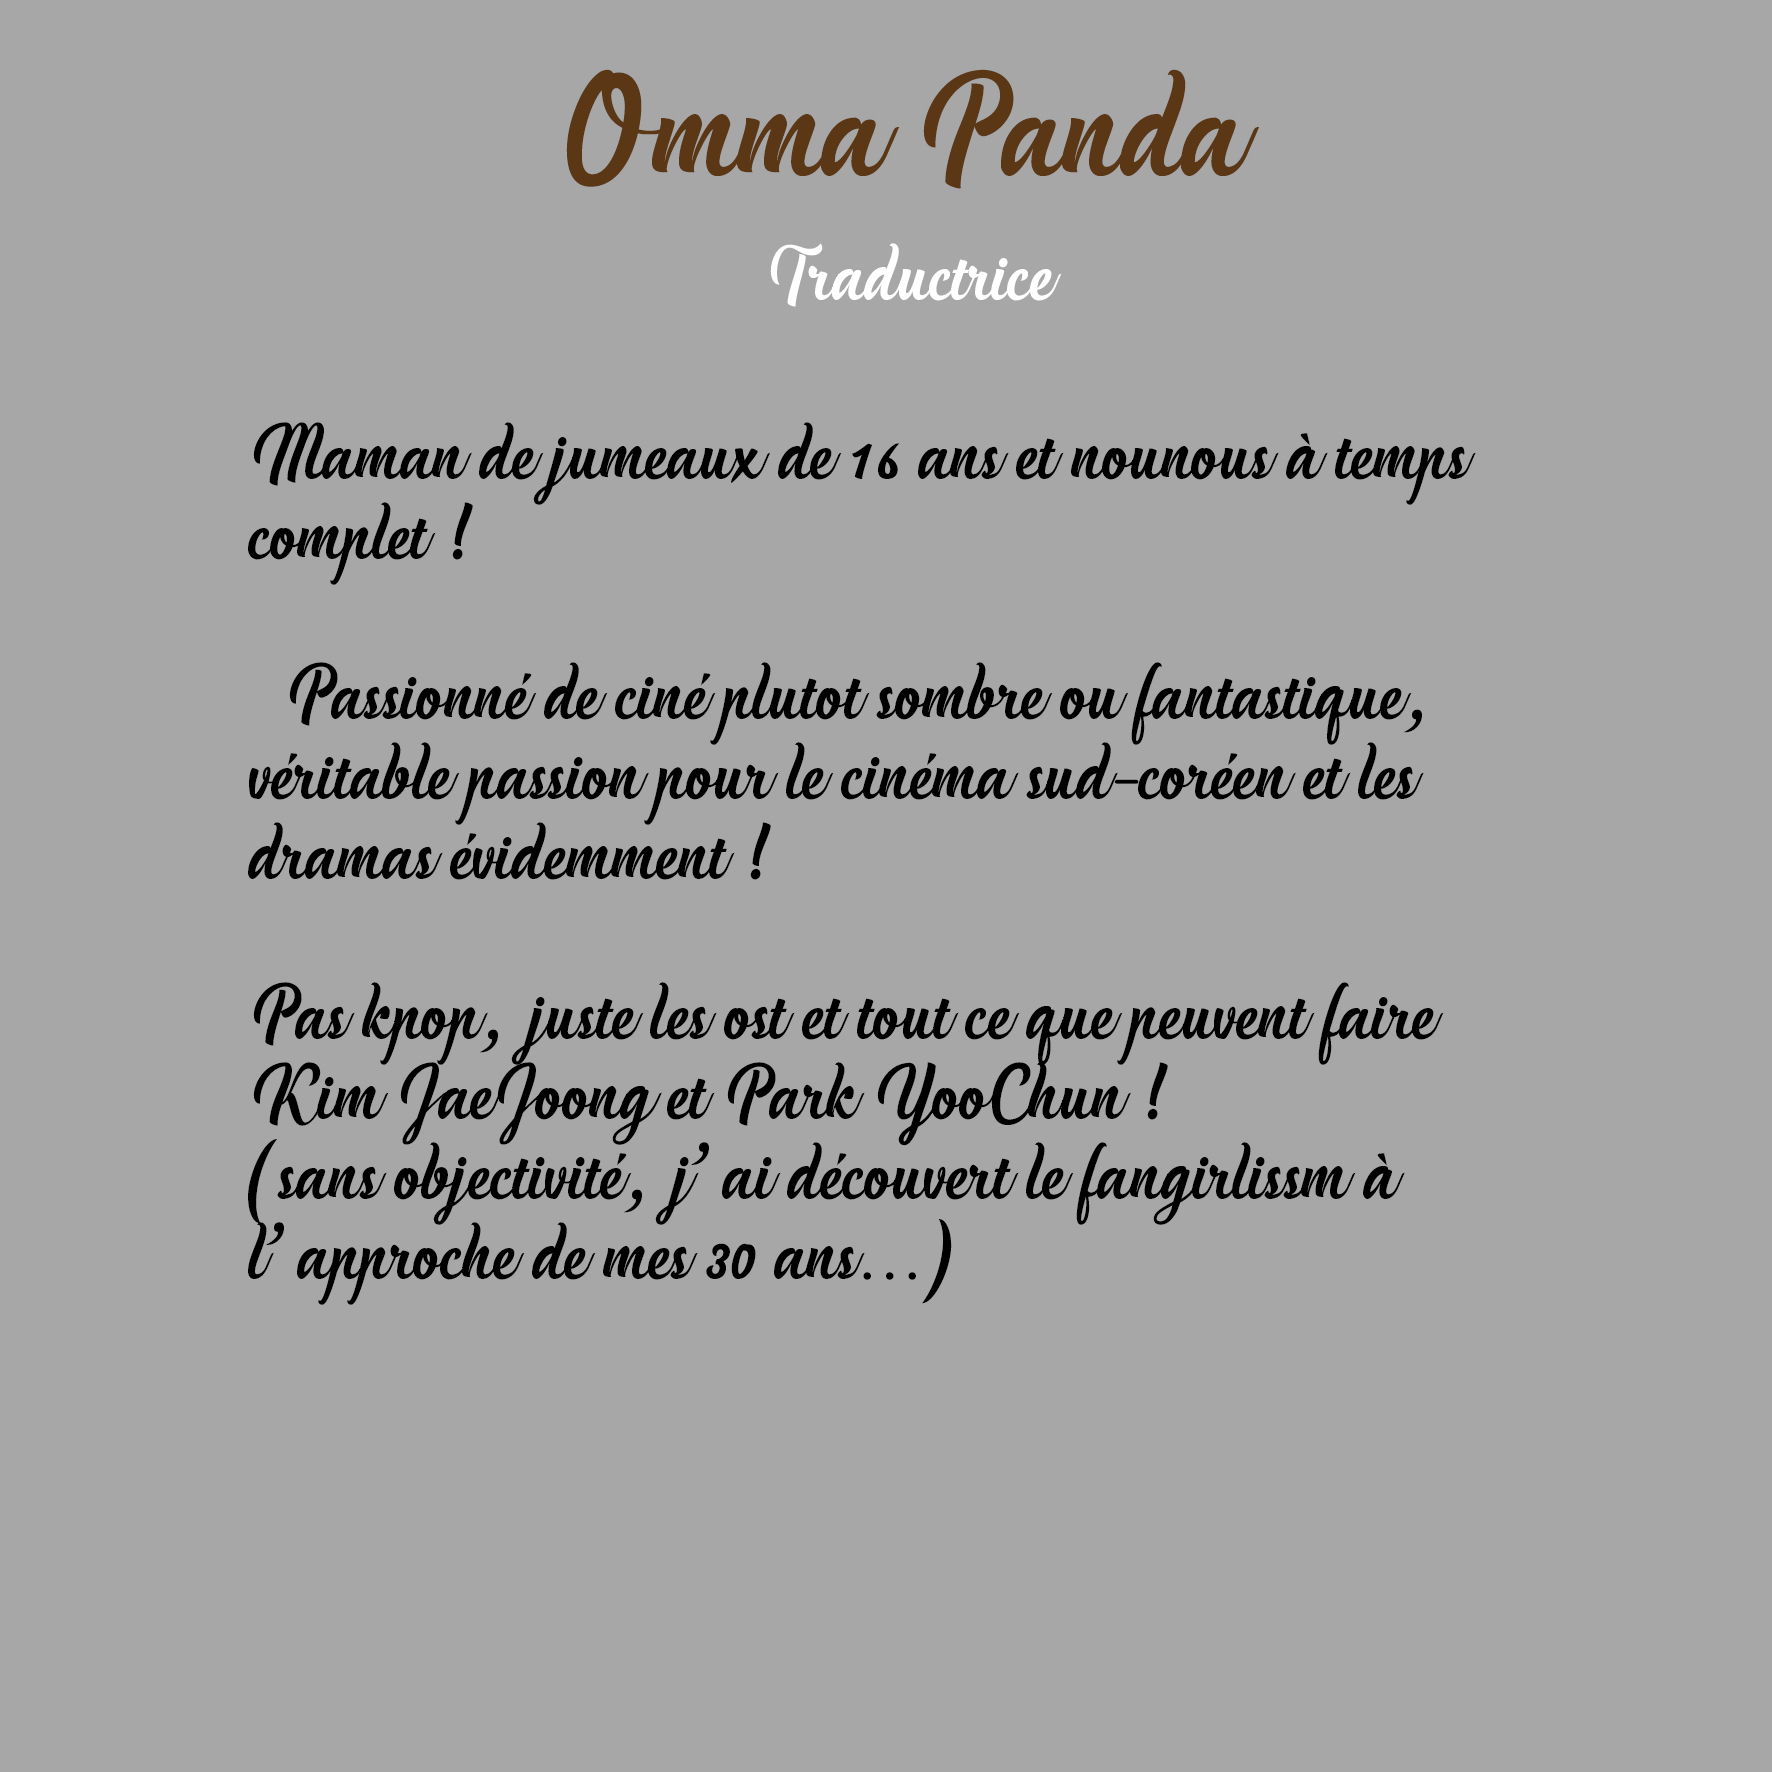 Presentation-omma-panda